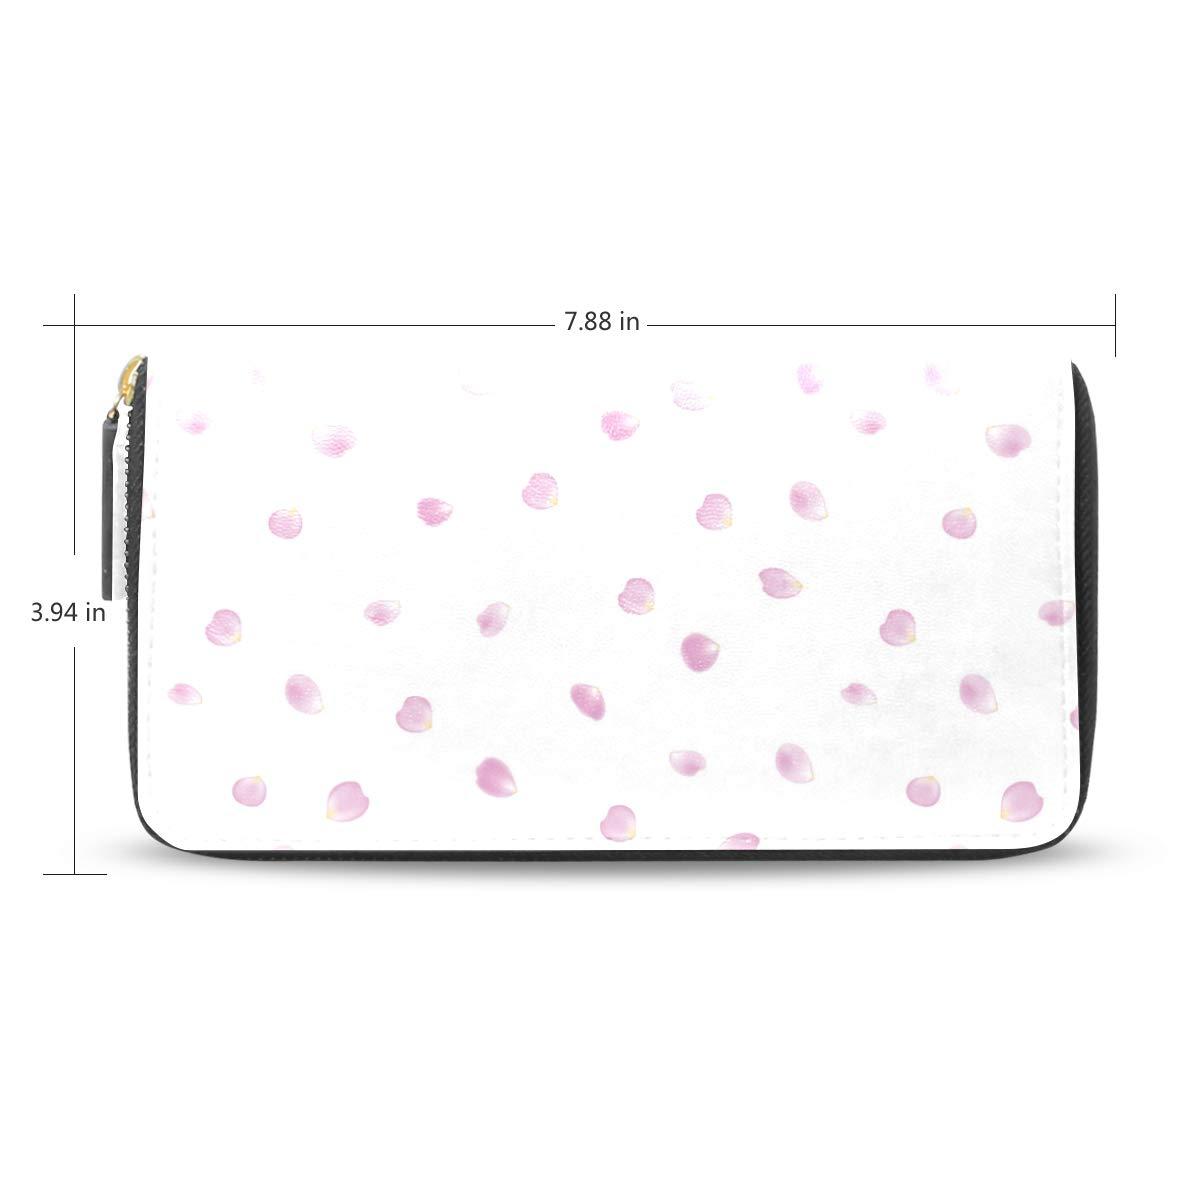 Women Pink Rose Petals Heart Shaped Leather Wallet Large Capacity Zipper Travel Wristlet Bags Clutch Cellphone Bag